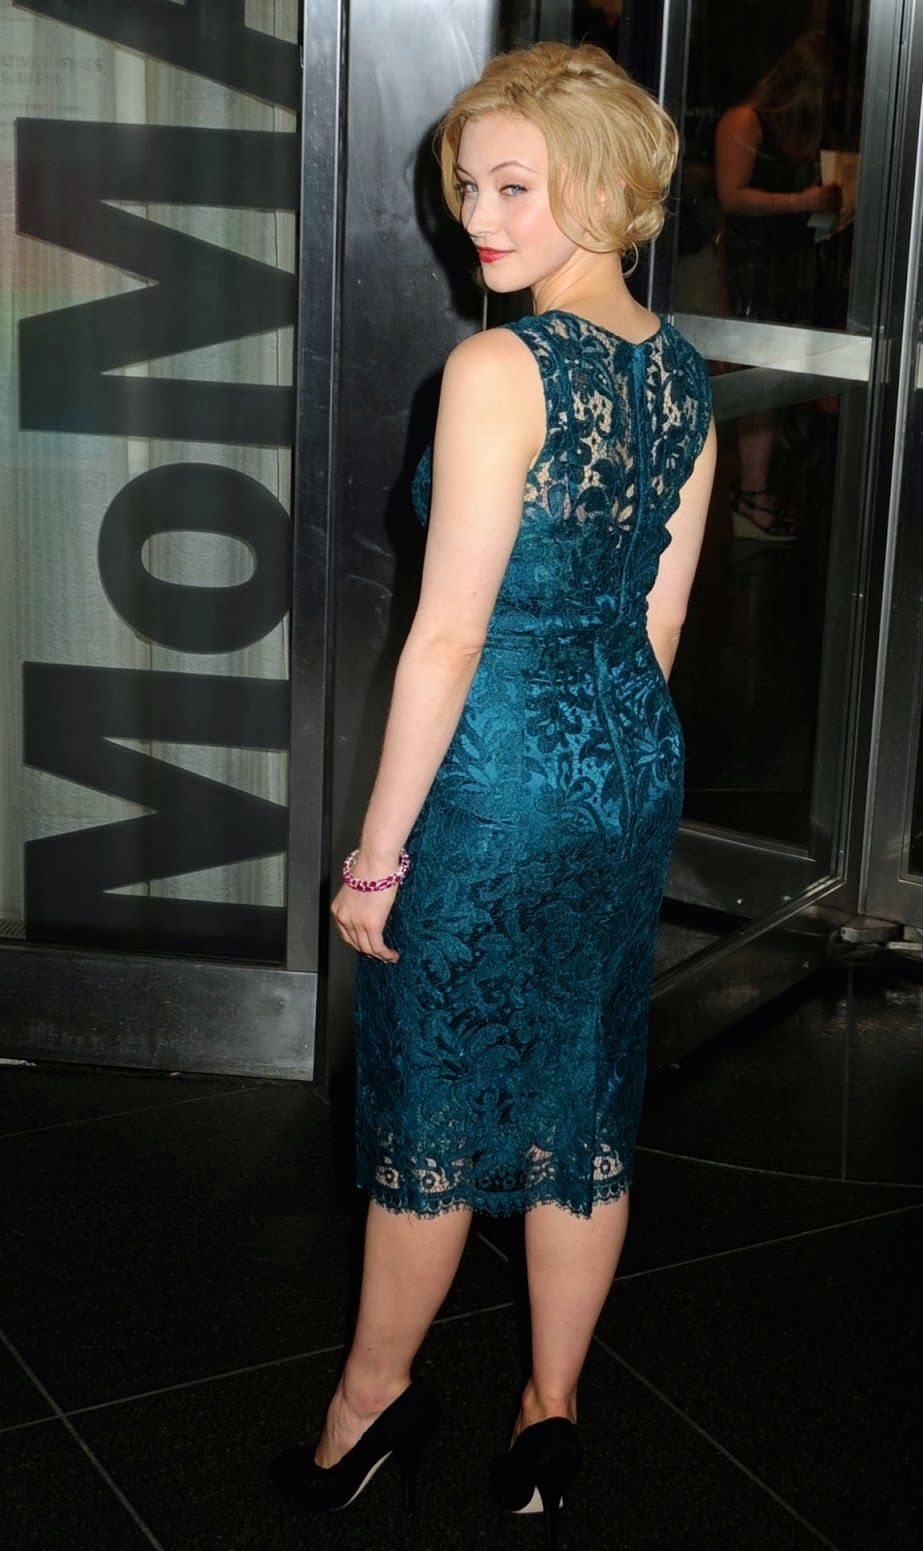 Sarah Gadon Classy Booty In A Blue Floral Satin Dress Celebrity